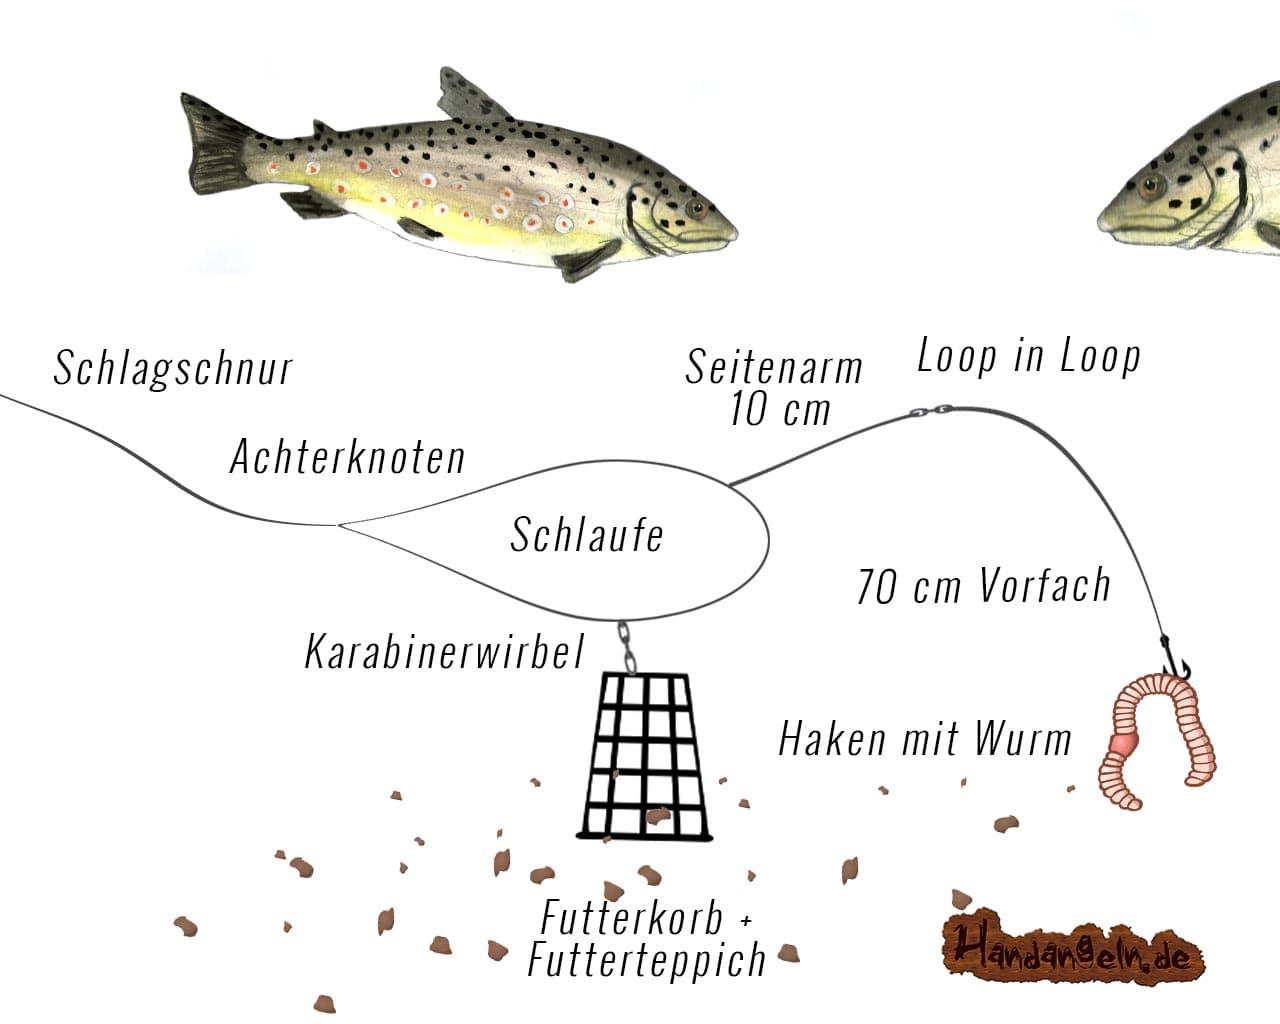 Futterkorb Montage Forelle Fluss Seitenarm